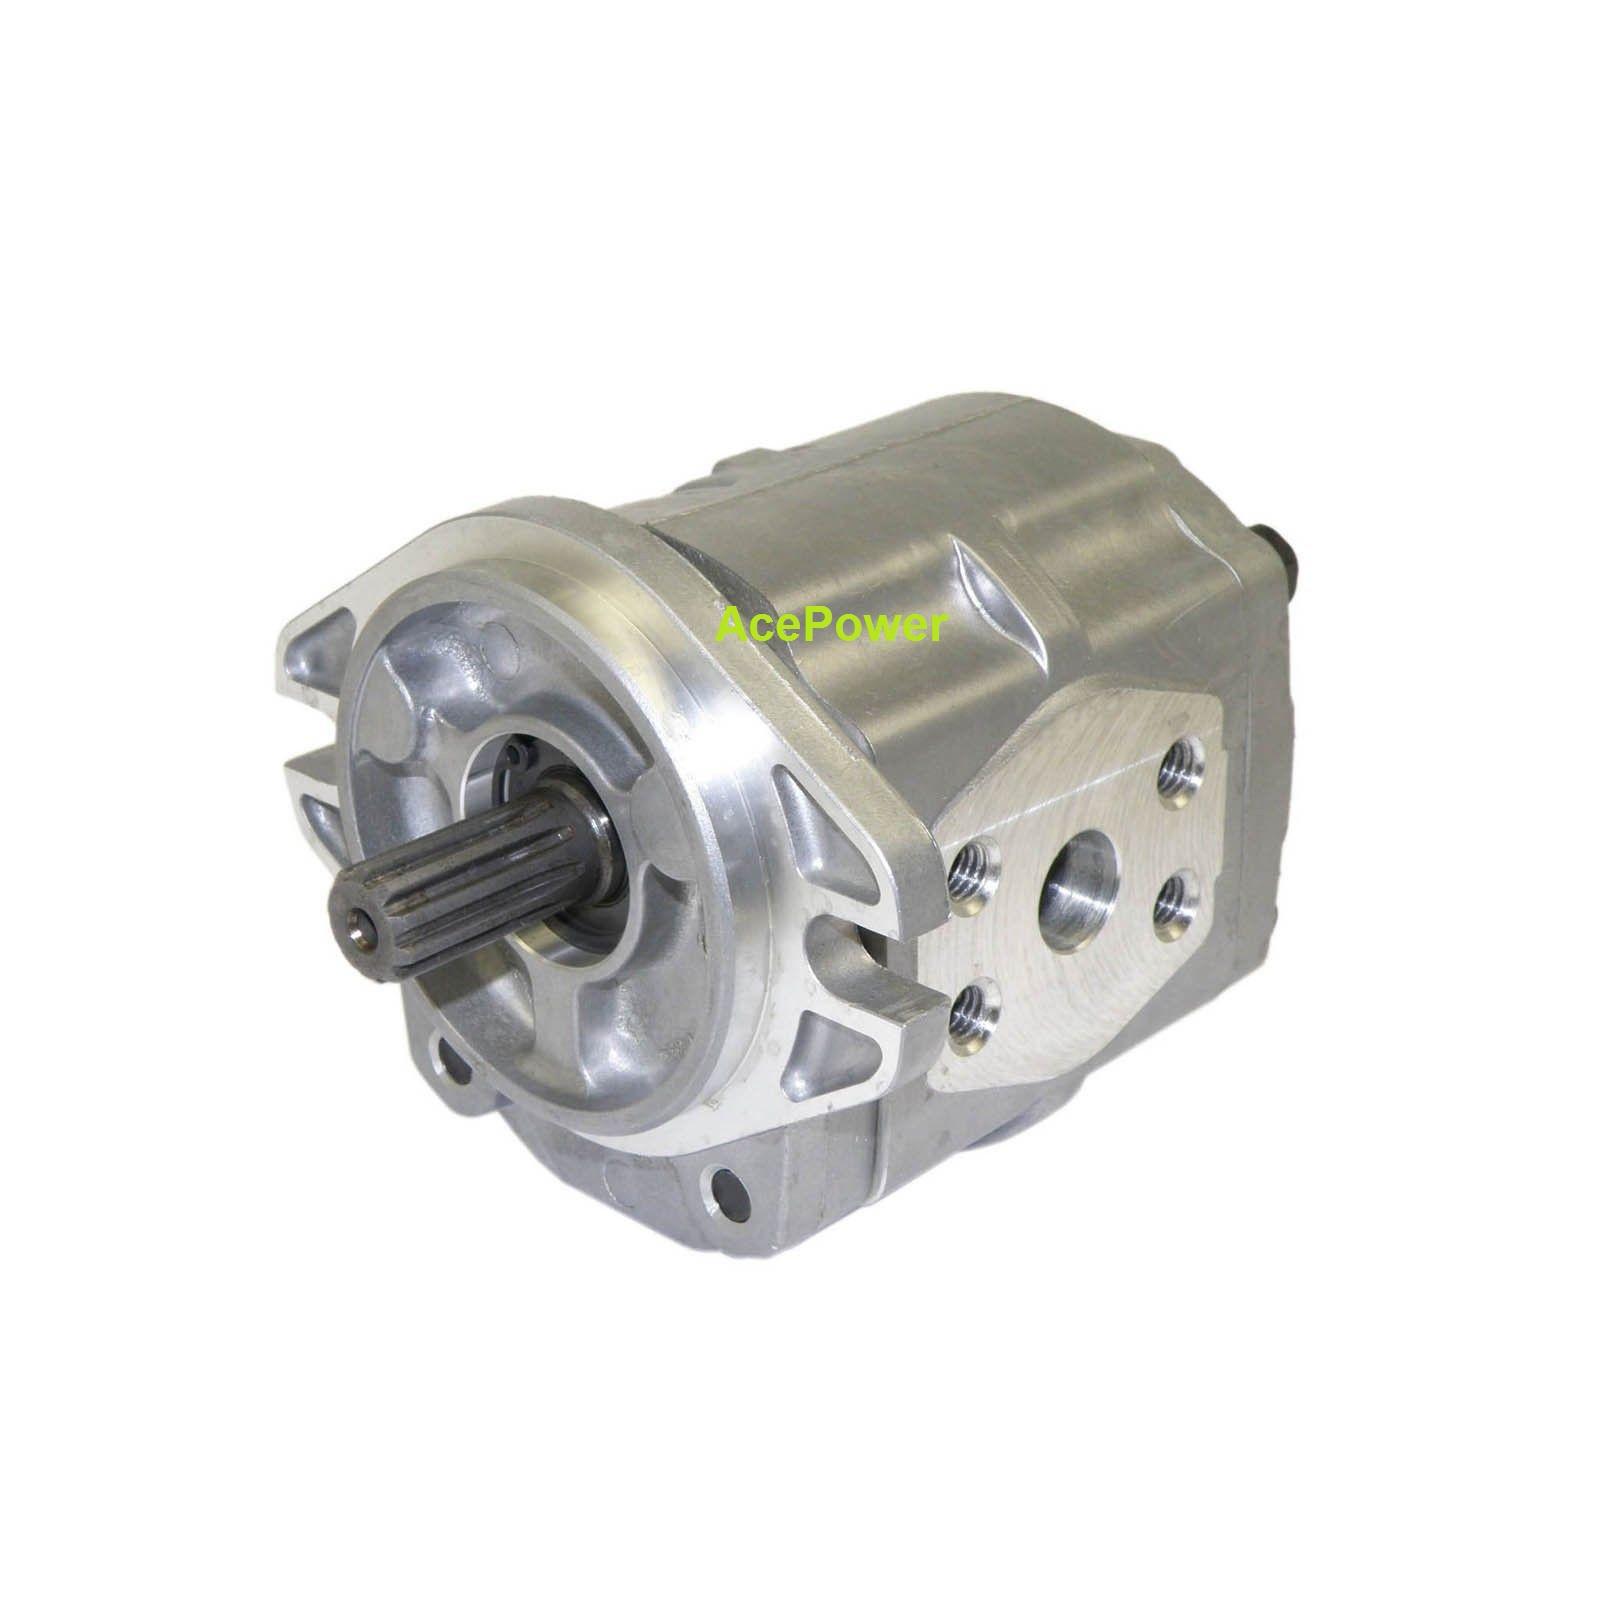 Komatsu Forklift Pump-Hyd. 3EB-60-12251